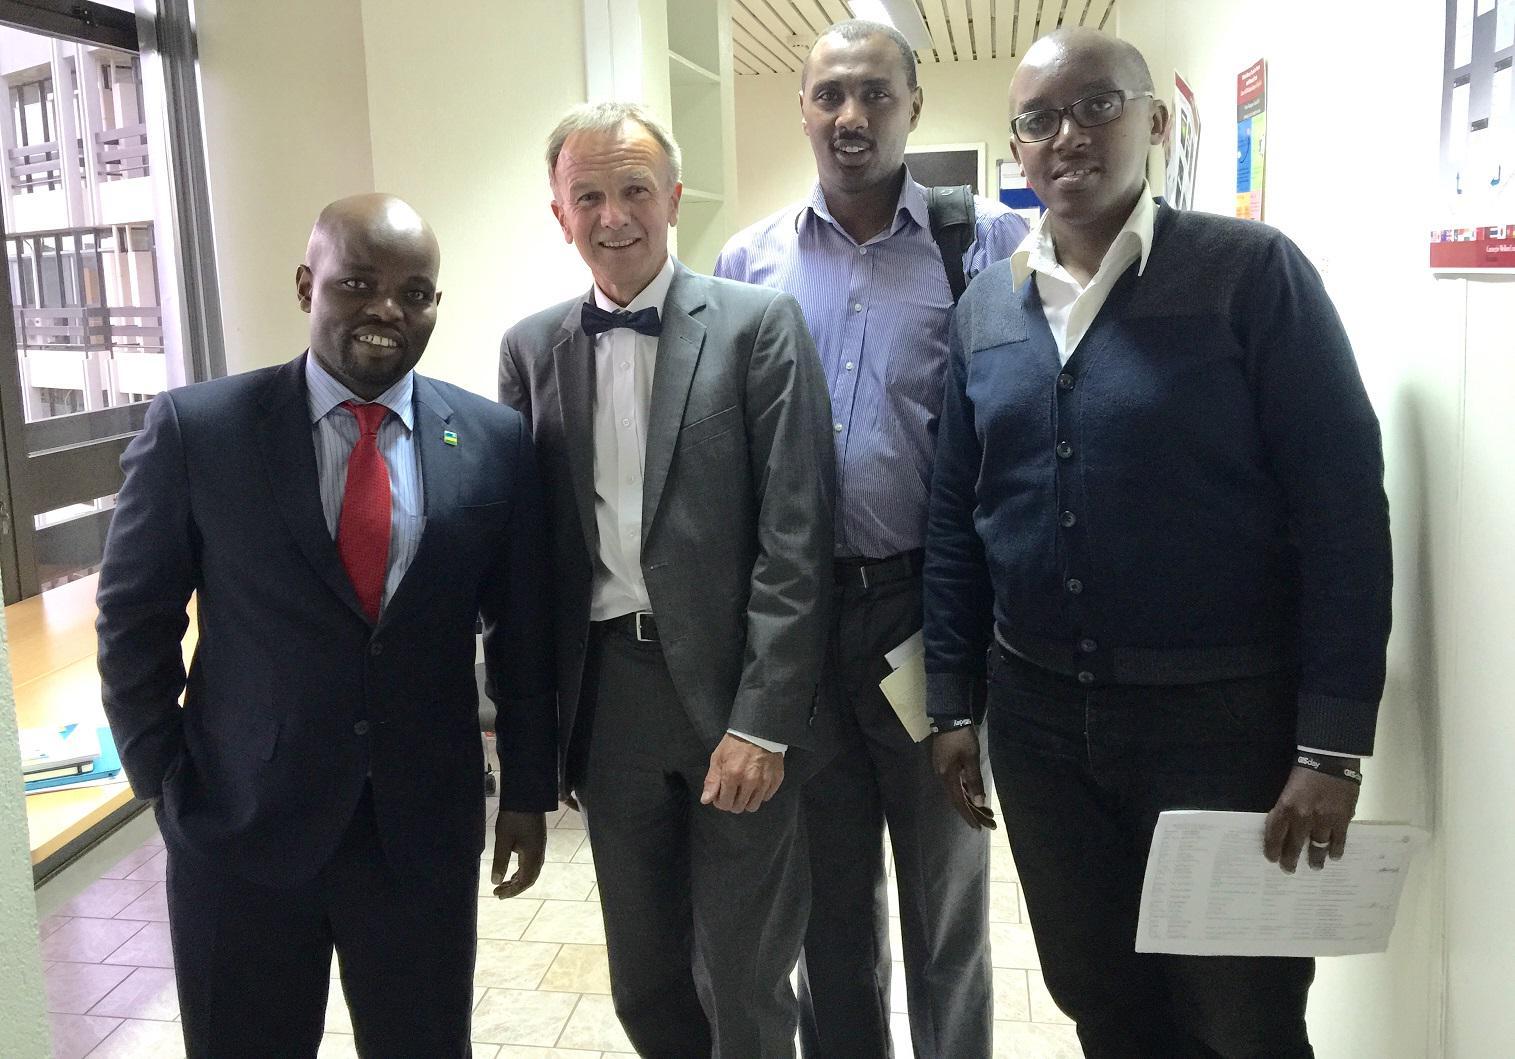 Last week Rwanda's Minister of Youth&ICT visited the #GISDay encouraging Data Sharing @MyictRwanda @Esri @cmu_rwanda http://t.co/jtk8POlaxN